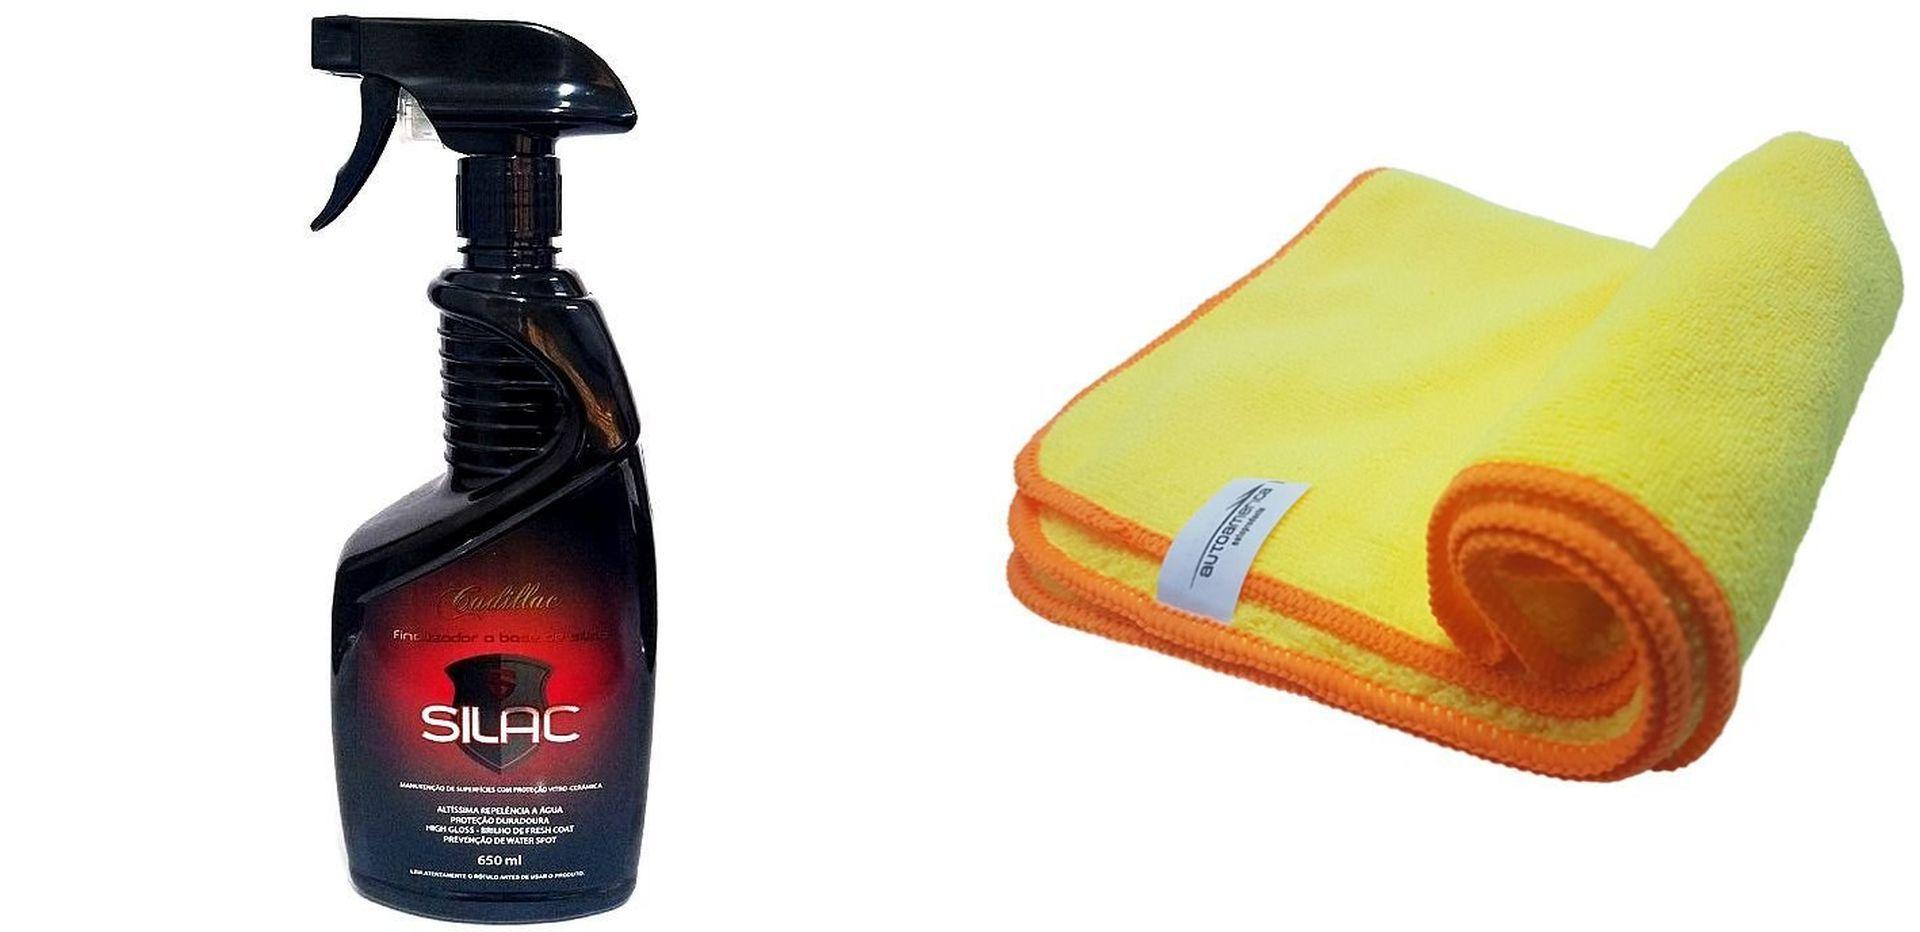 Kit Finalizador Silac + Flanela de Microfibra 60X40 (Sem Embalagem)